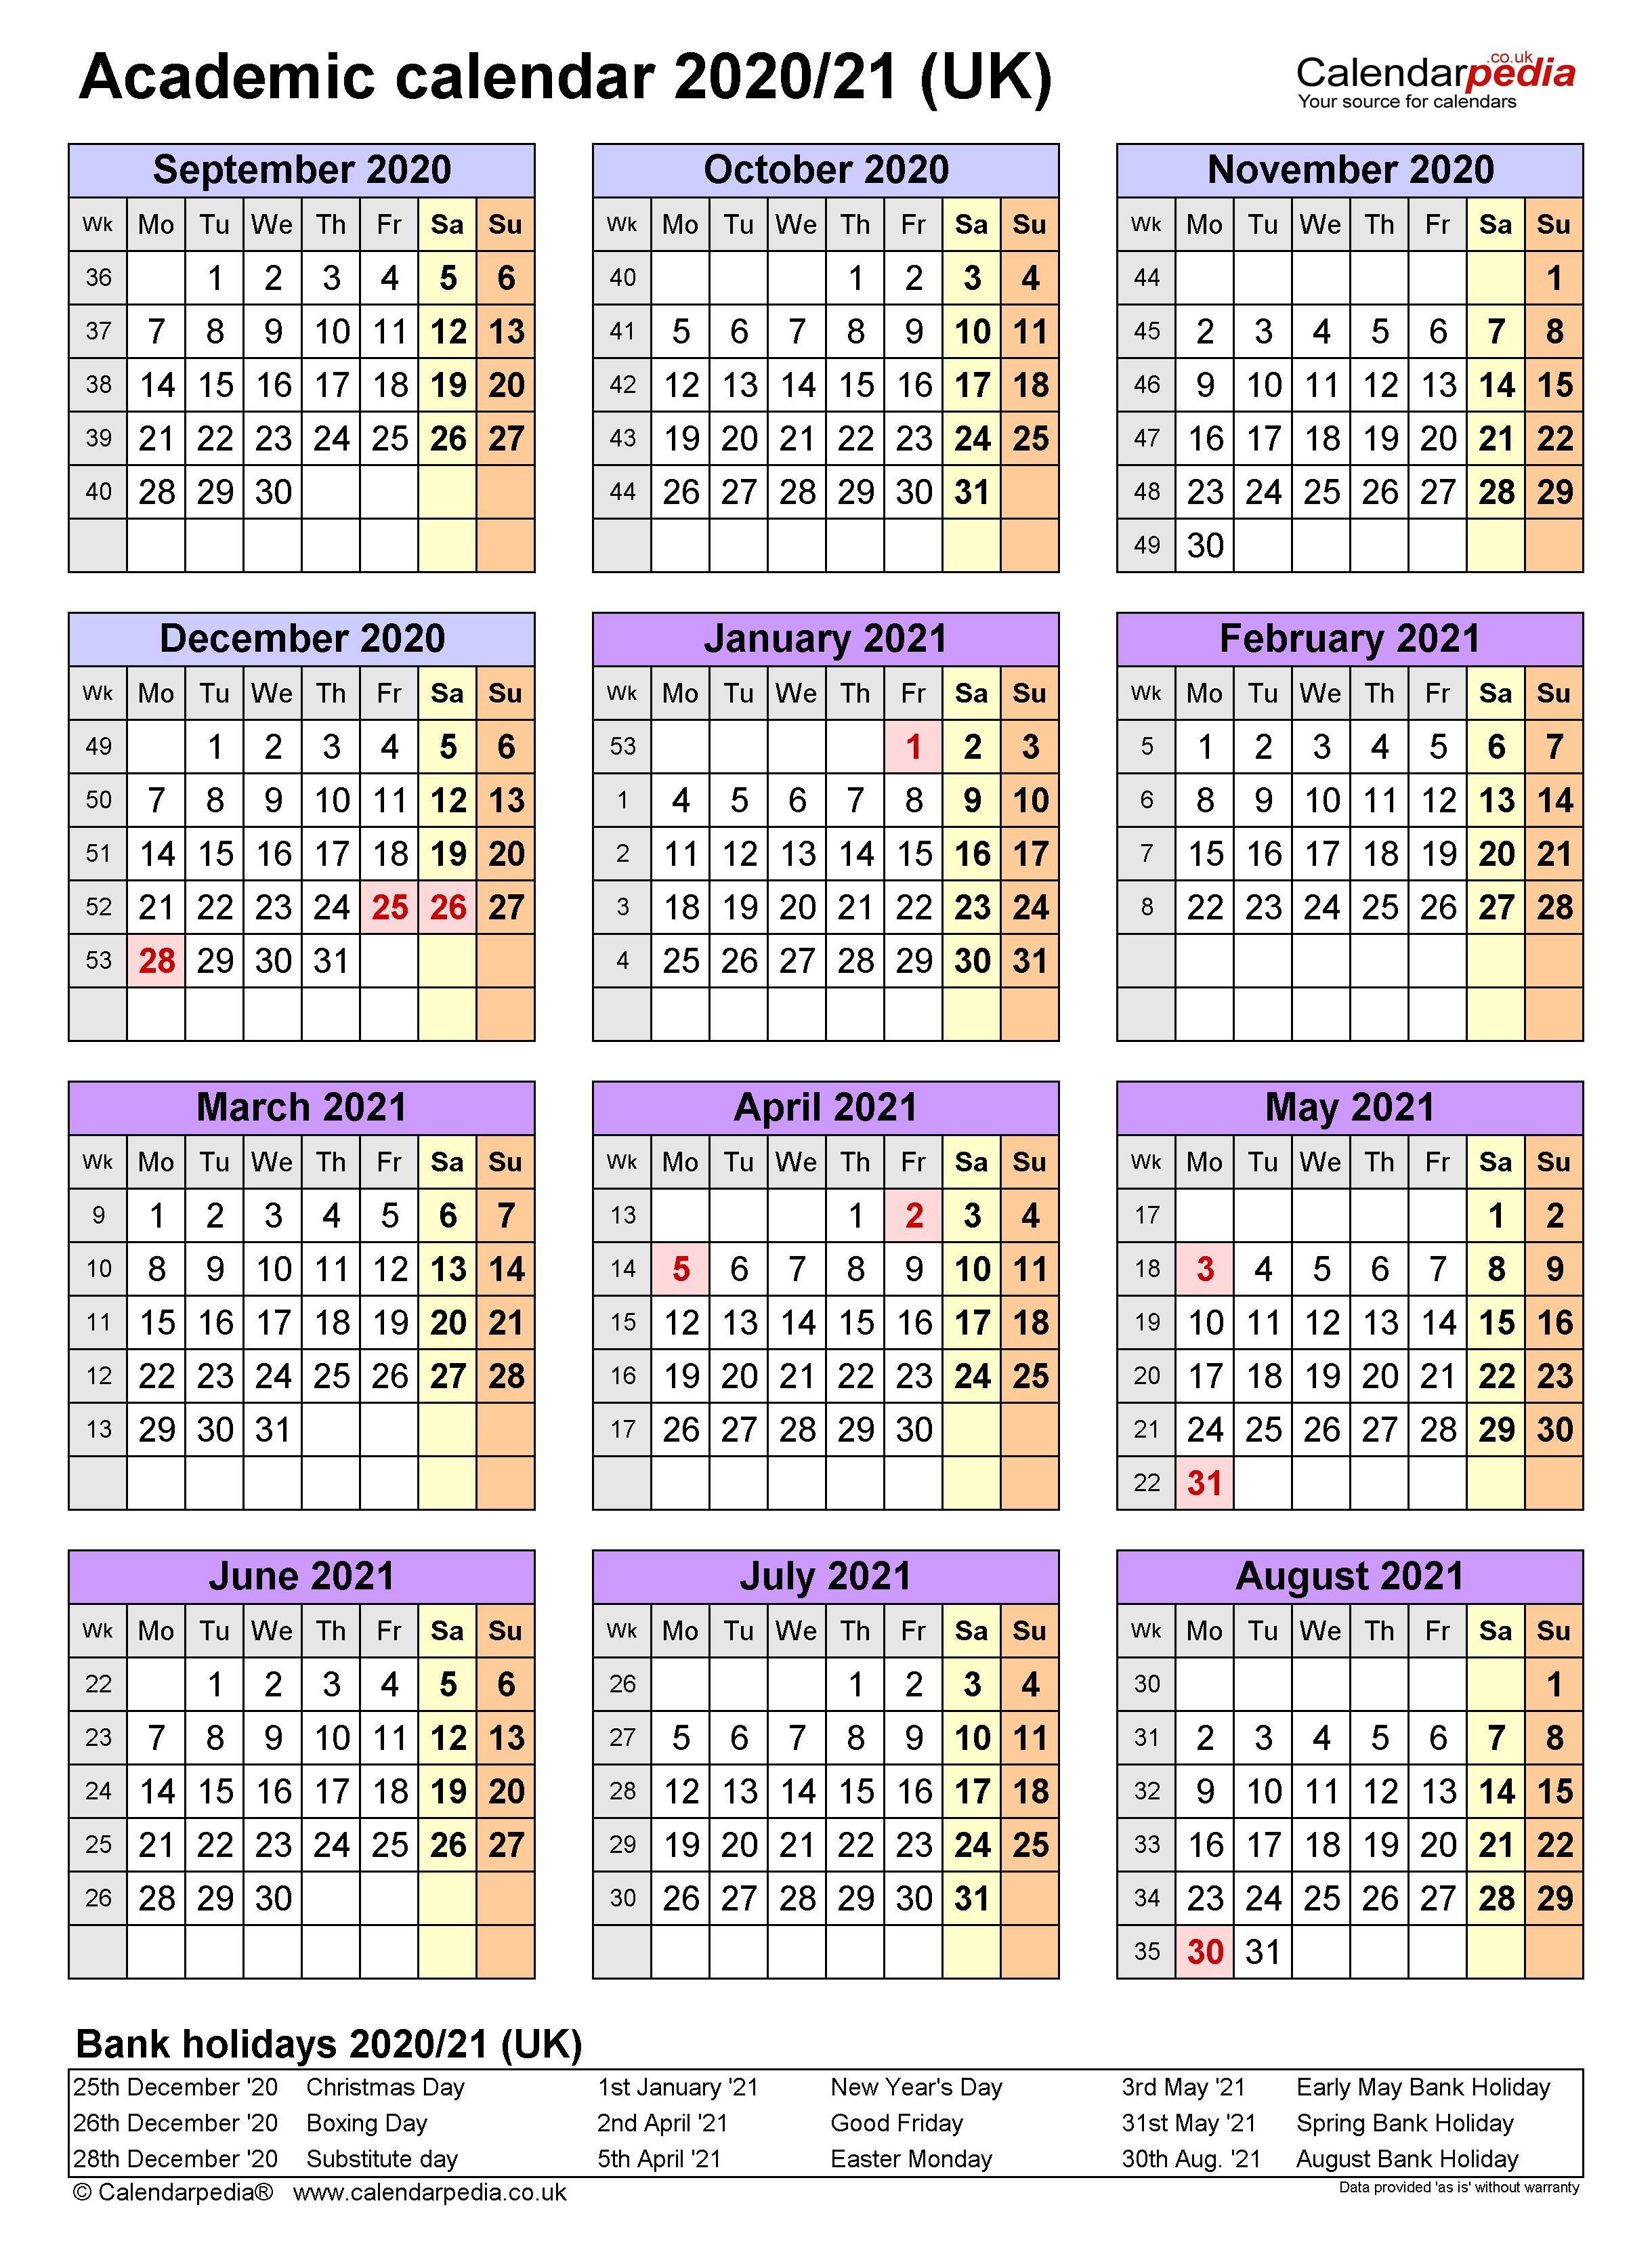 Academic Calendars 2020/21 Uk – Free Printable Word Templates Intended For Uri Academic Calendar 2021 2020